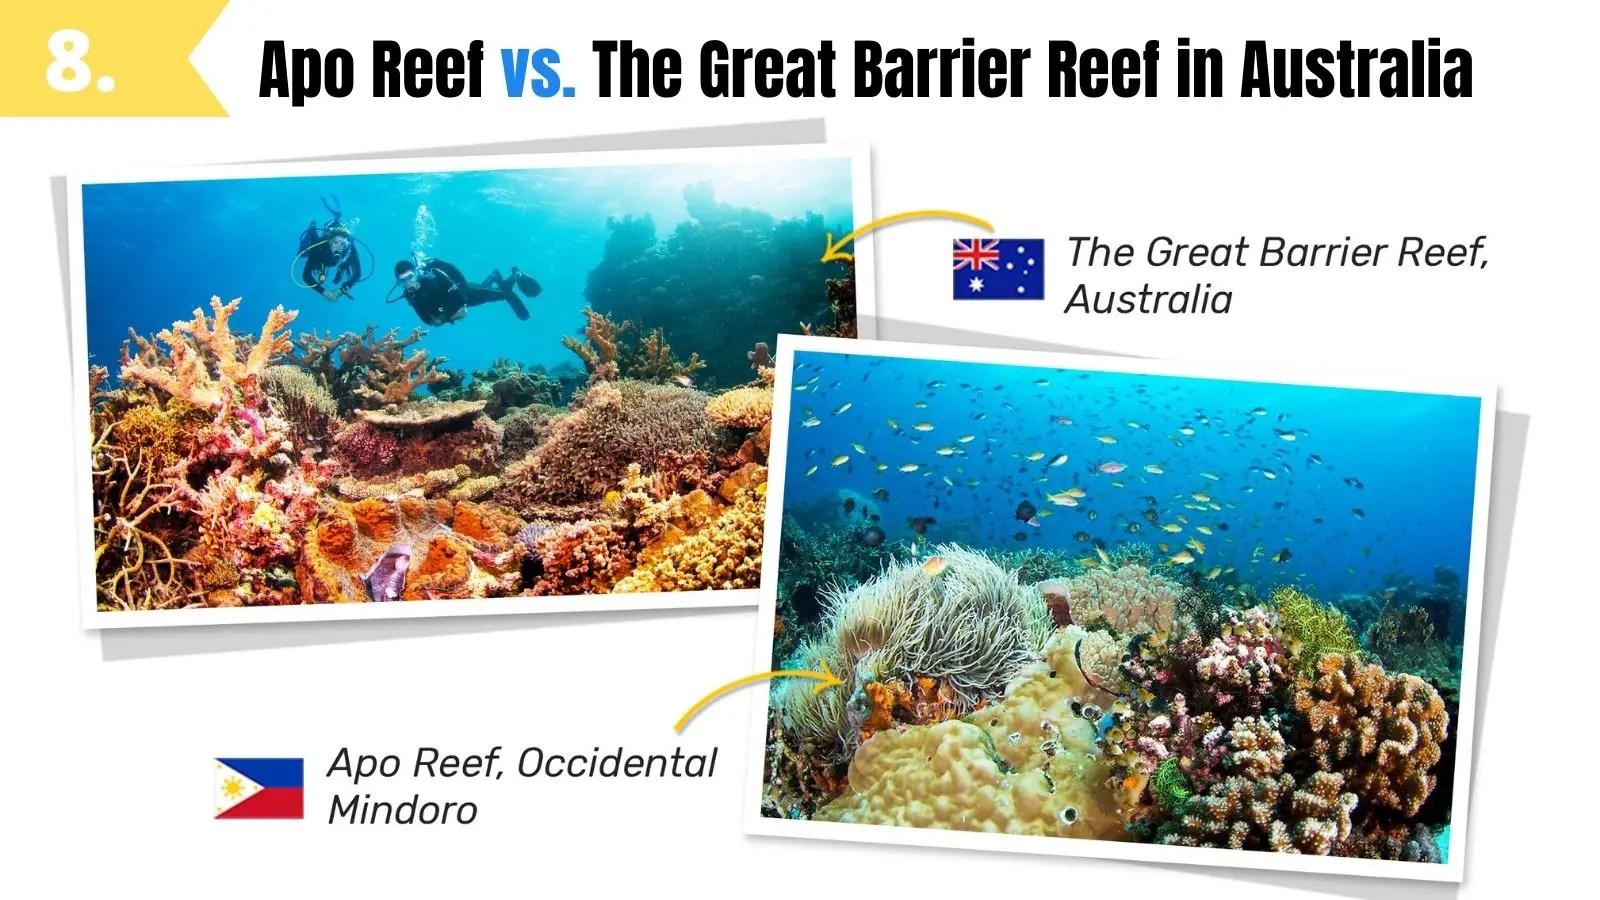 apo reef looks like the great barrier reef australia